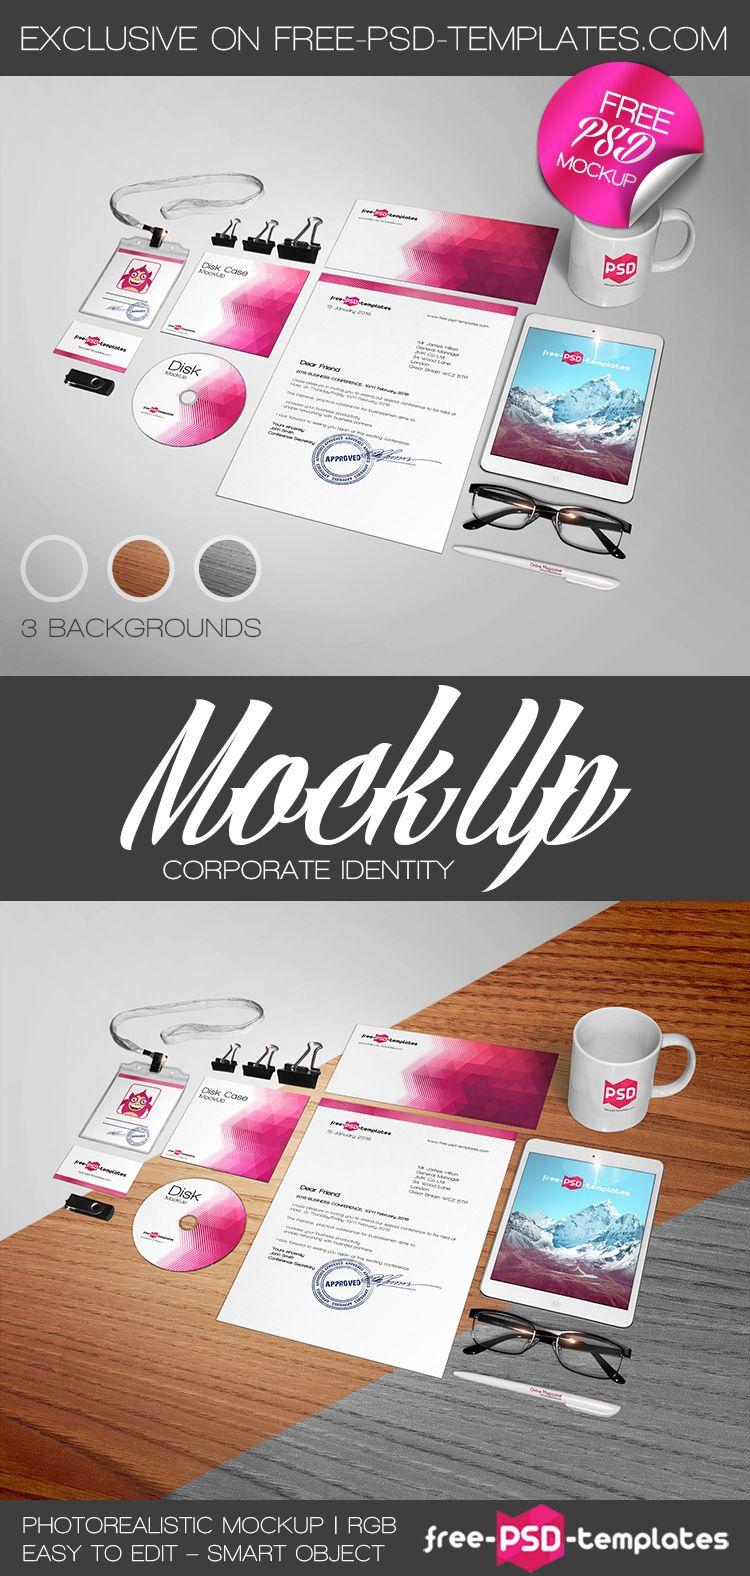 Free Corporate Identity Mockup Psd   Free PSD Templates   #free ...